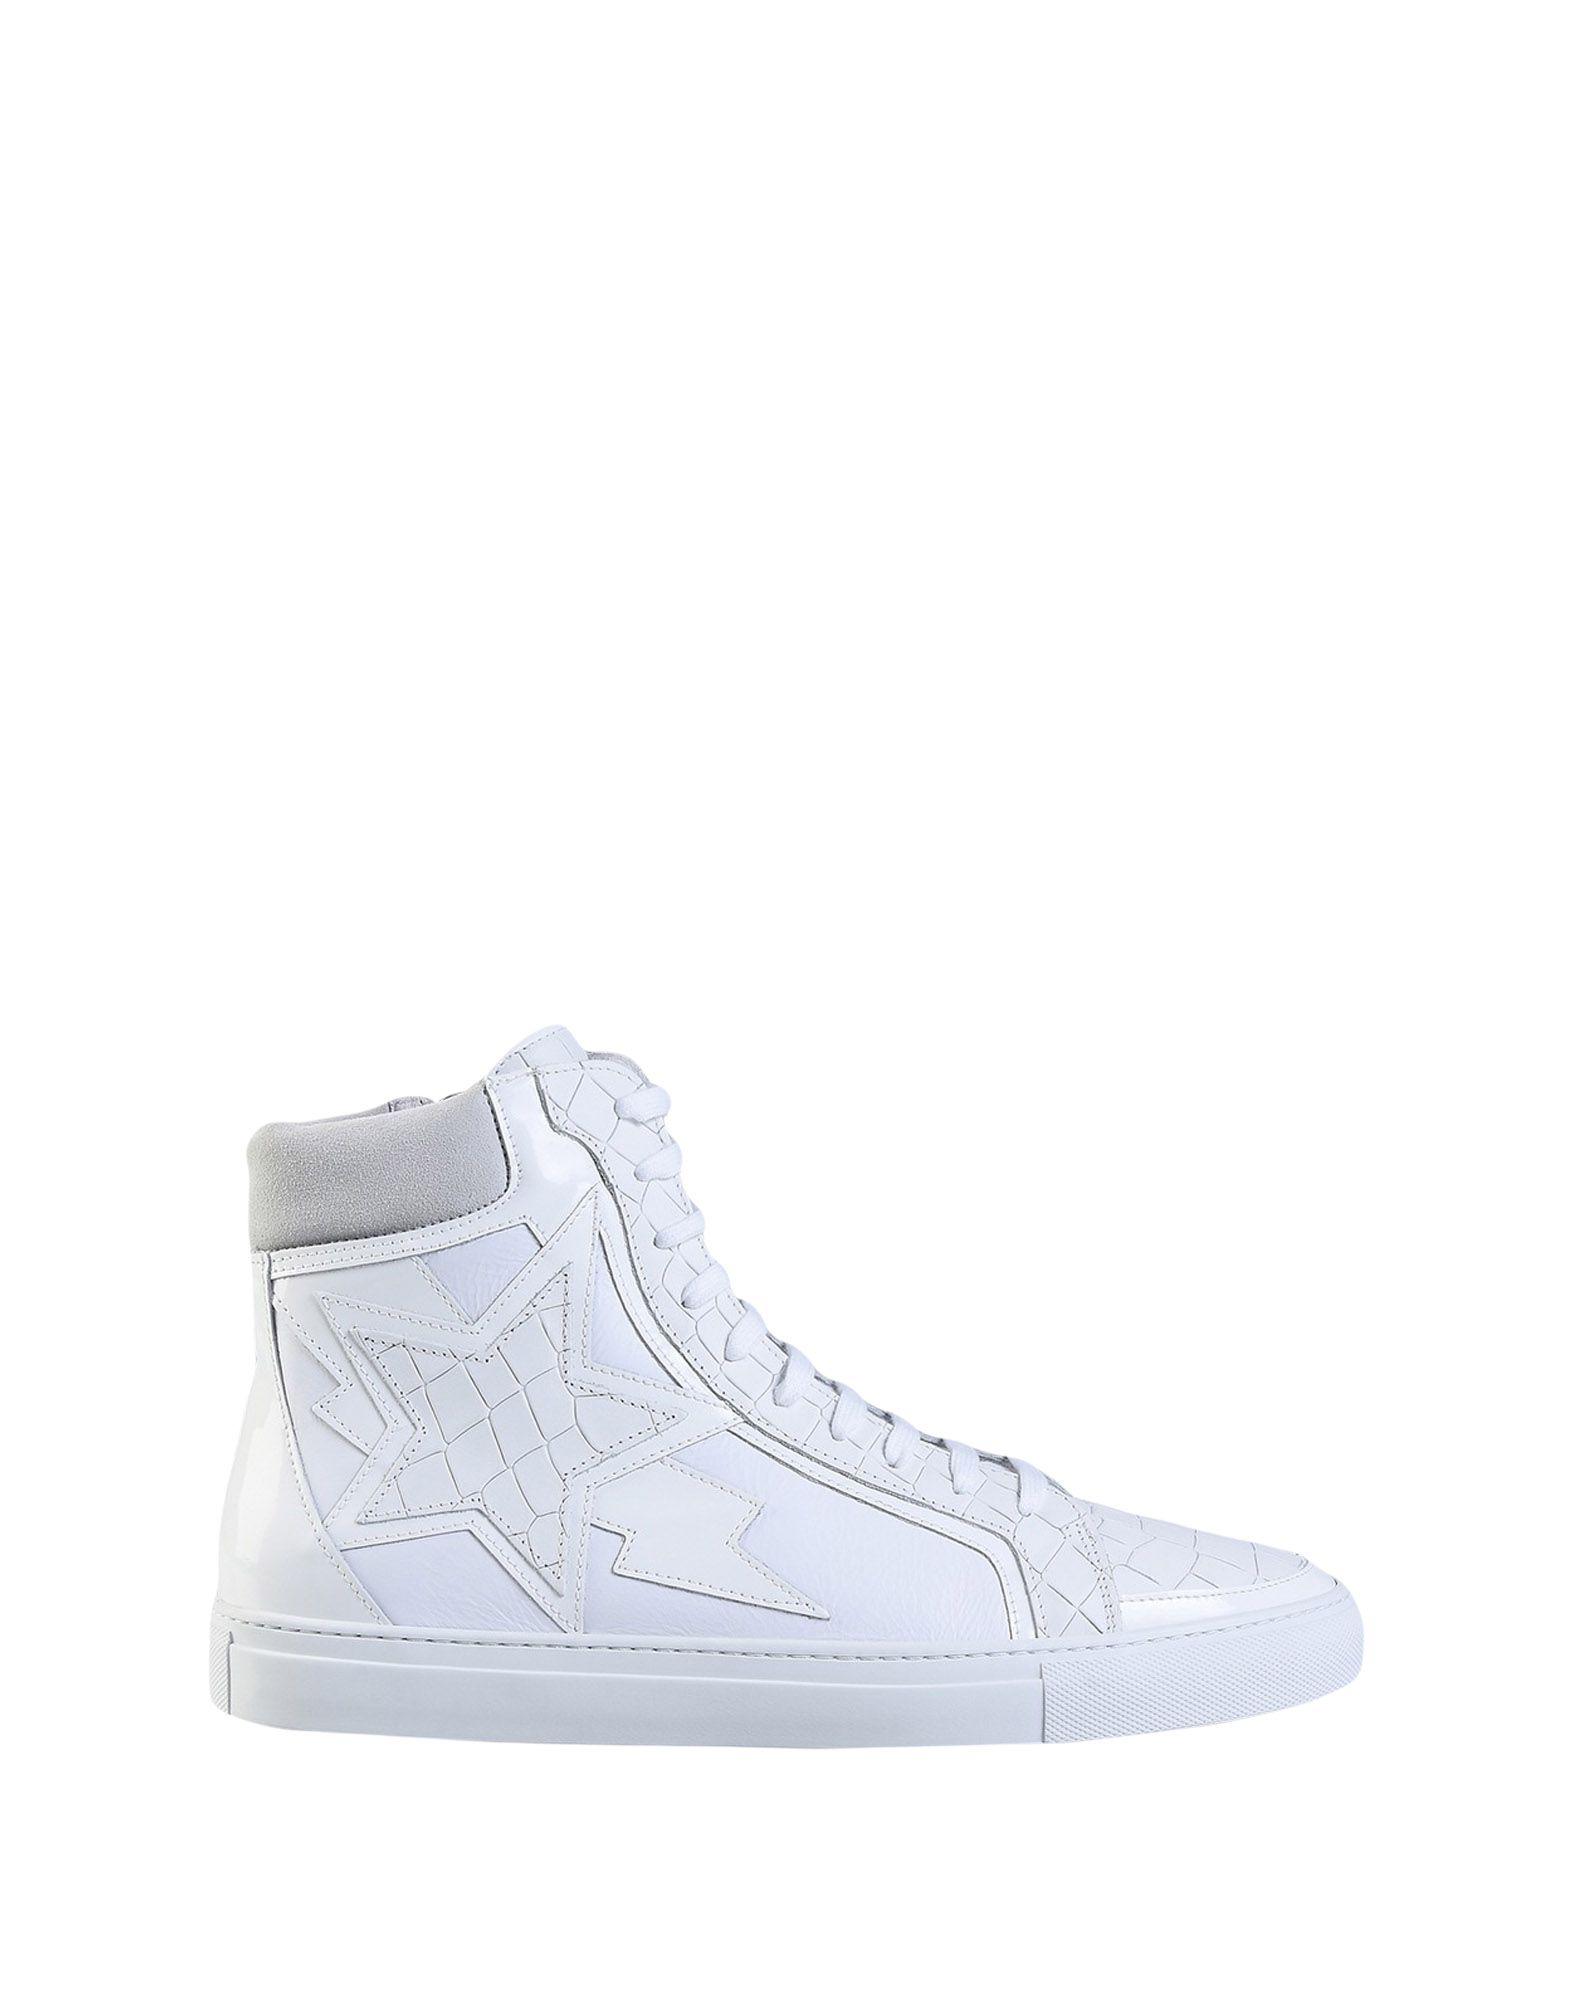 Sneakers Just Cavalli Homme - Sneakers Just Cavalli sur